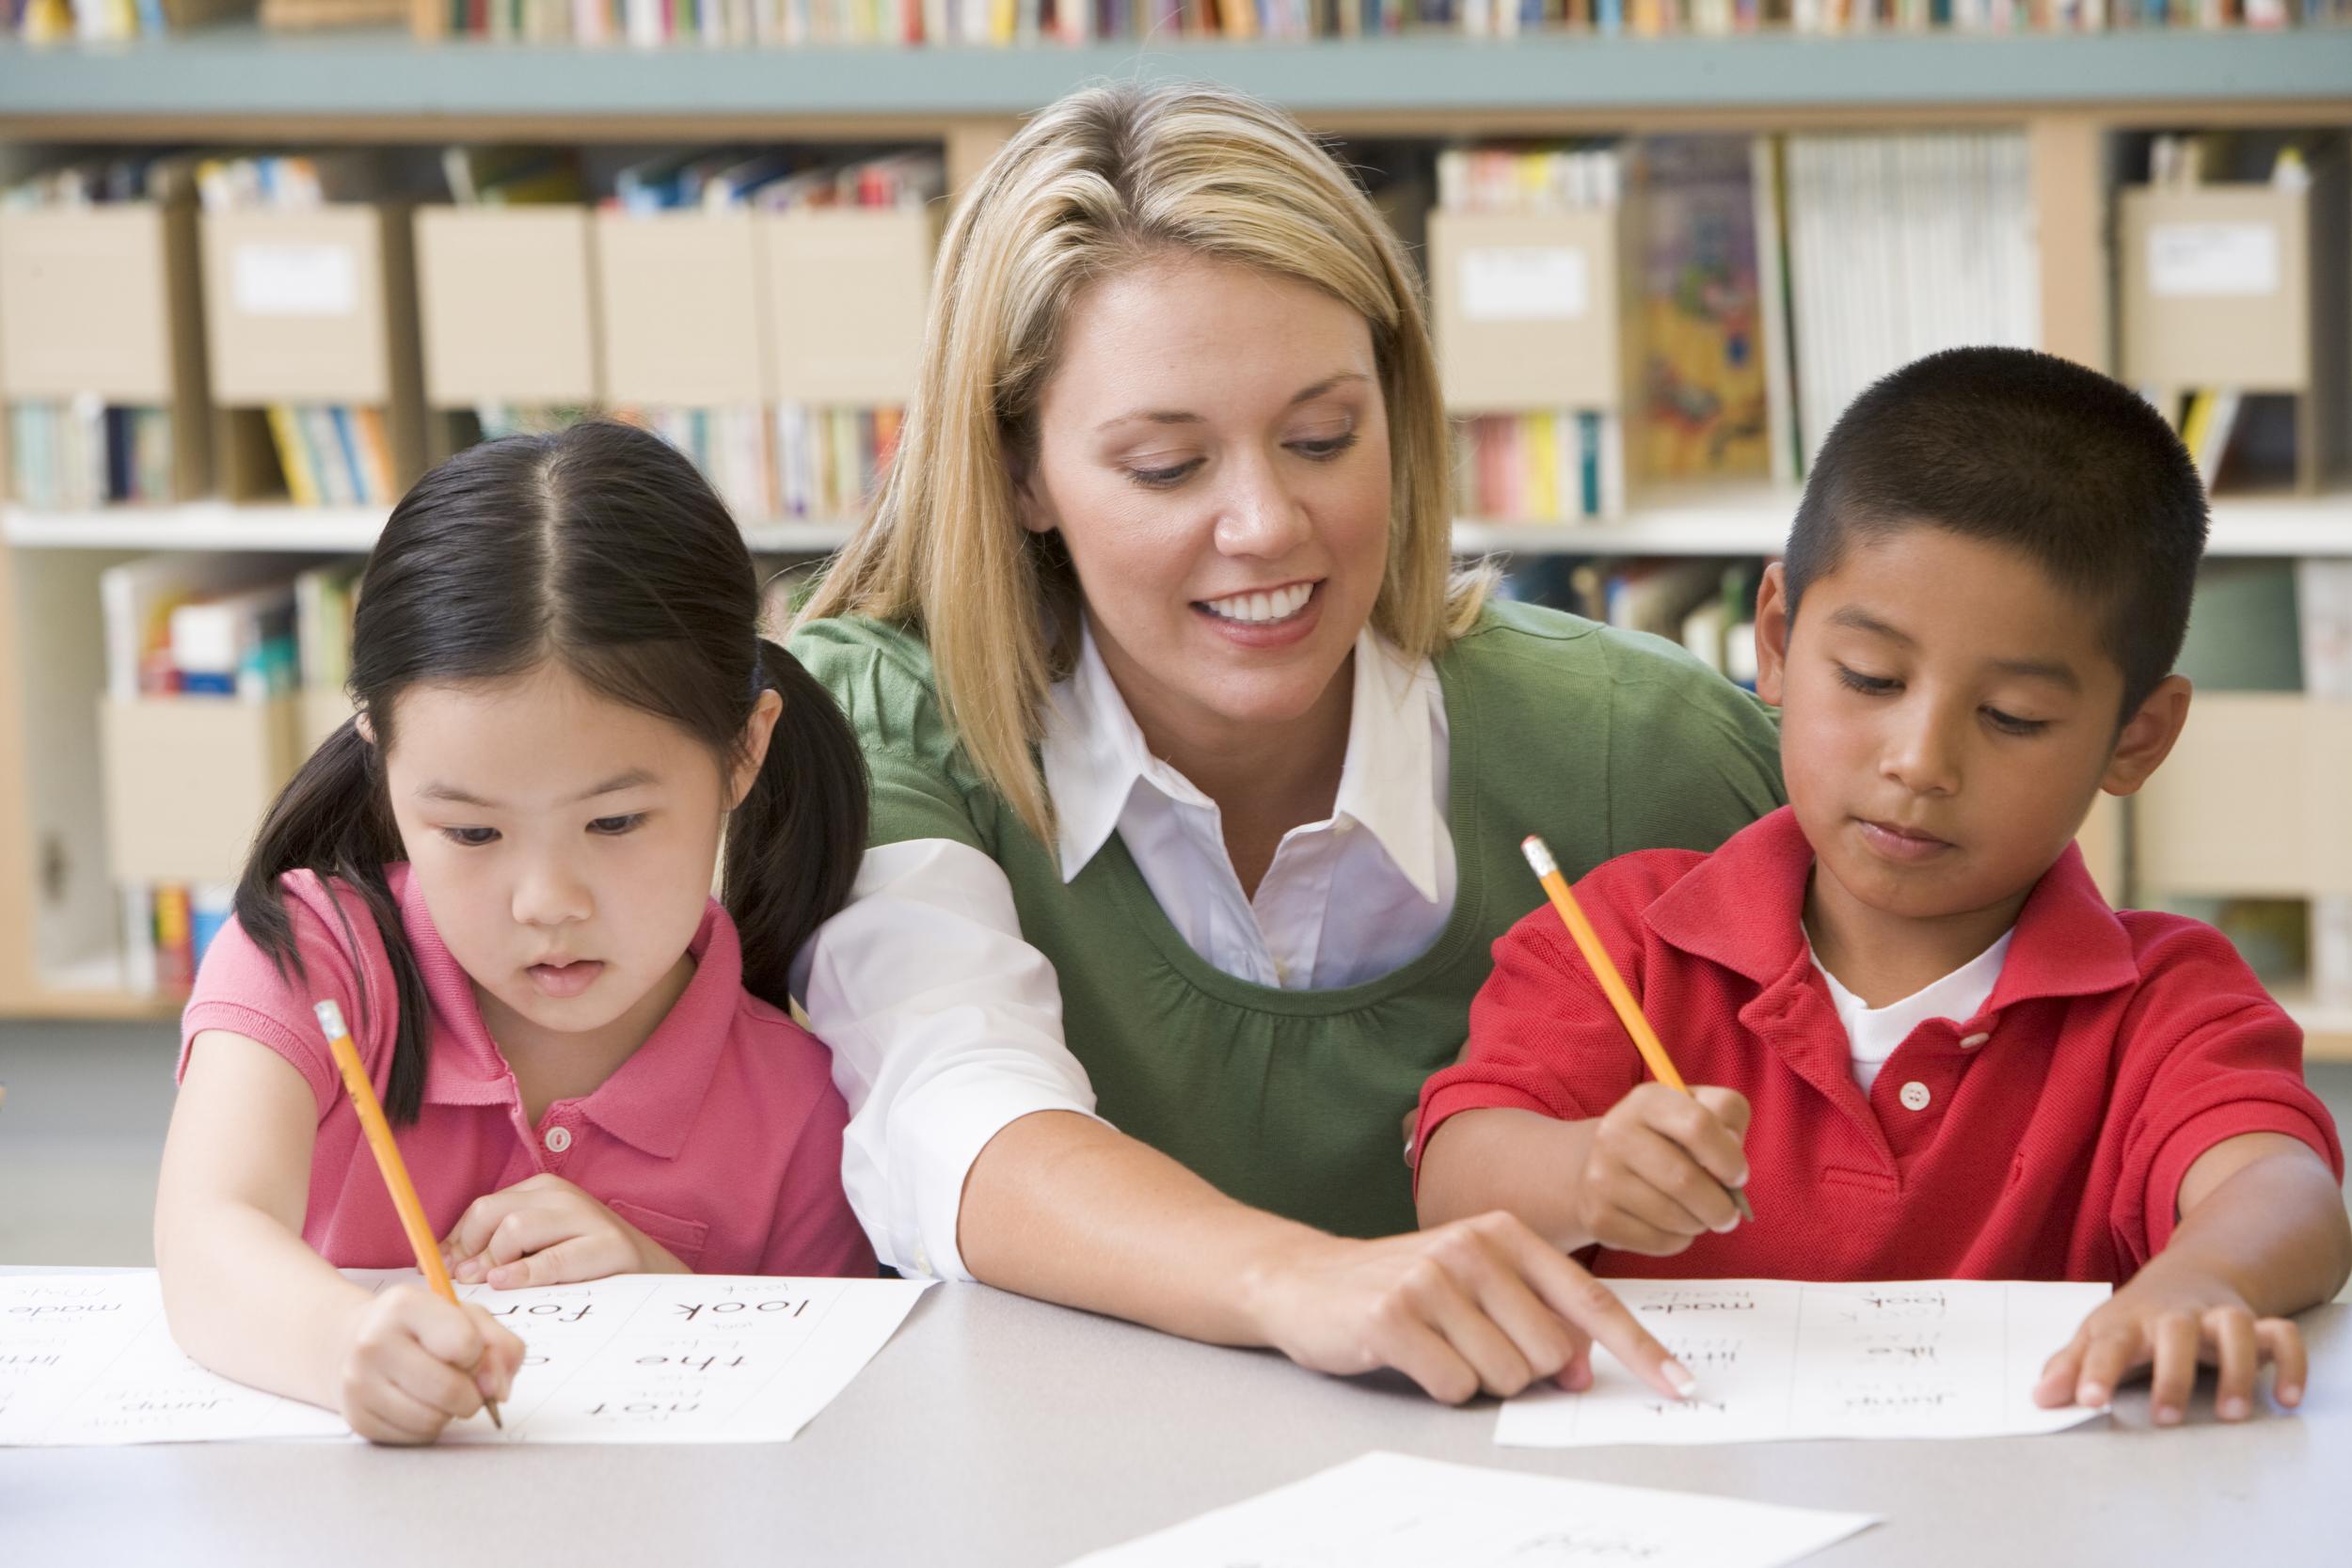 TeacherAndChildren.jpg